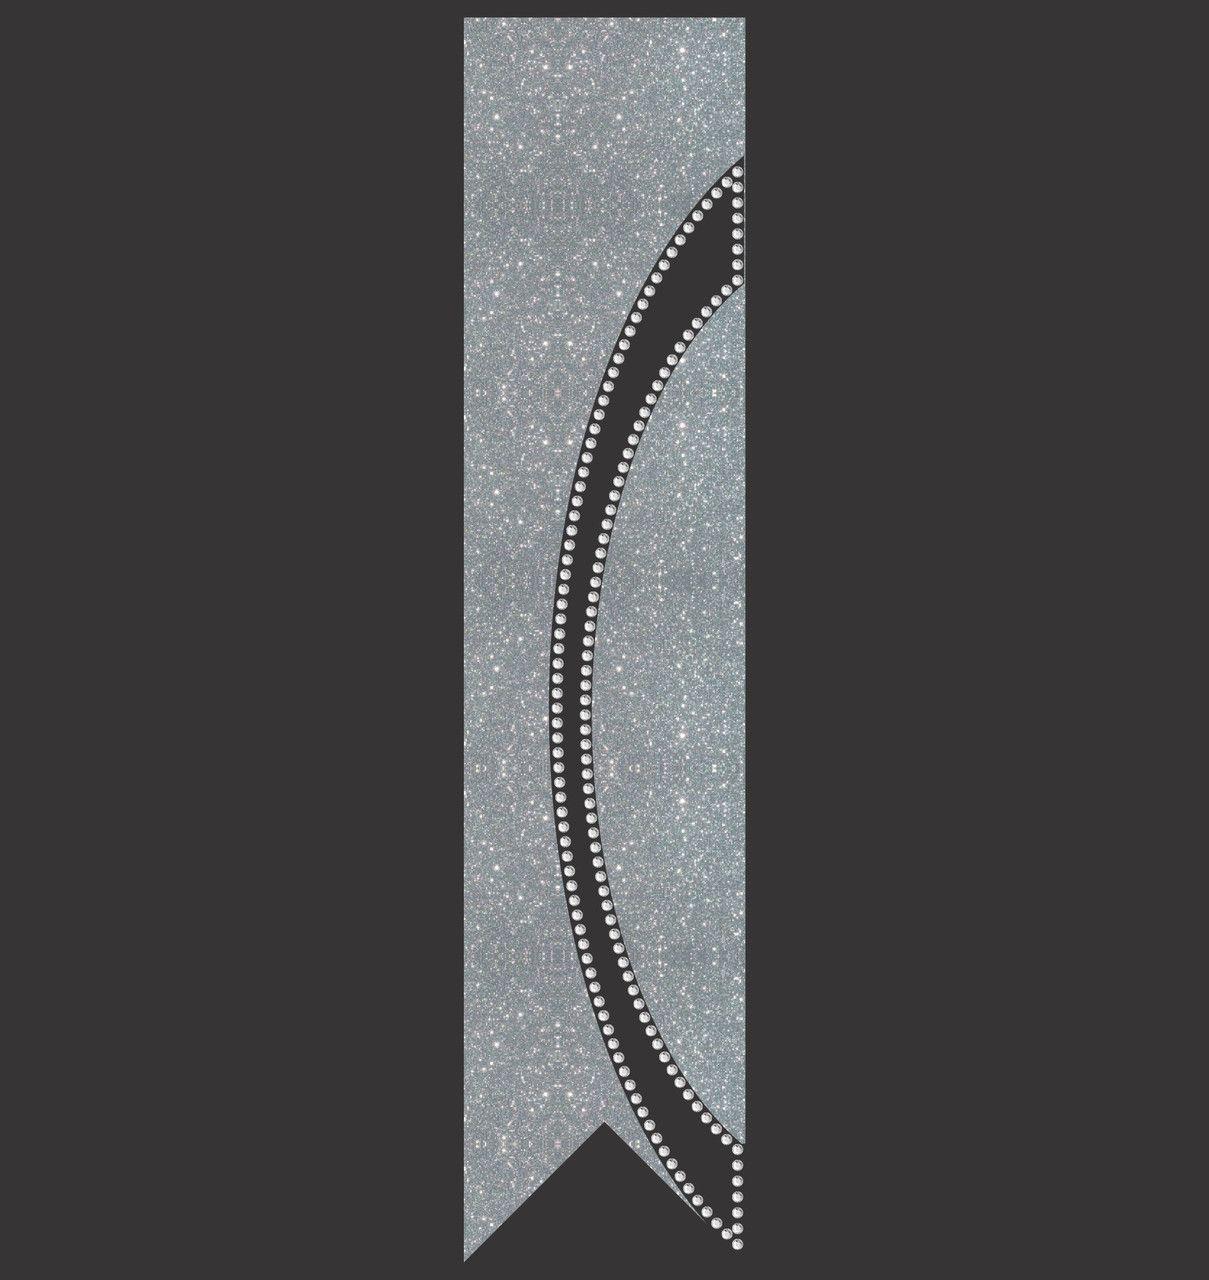 Kick Swish Vinyl Rhinestone Cheer Bow File Template Instant File Download